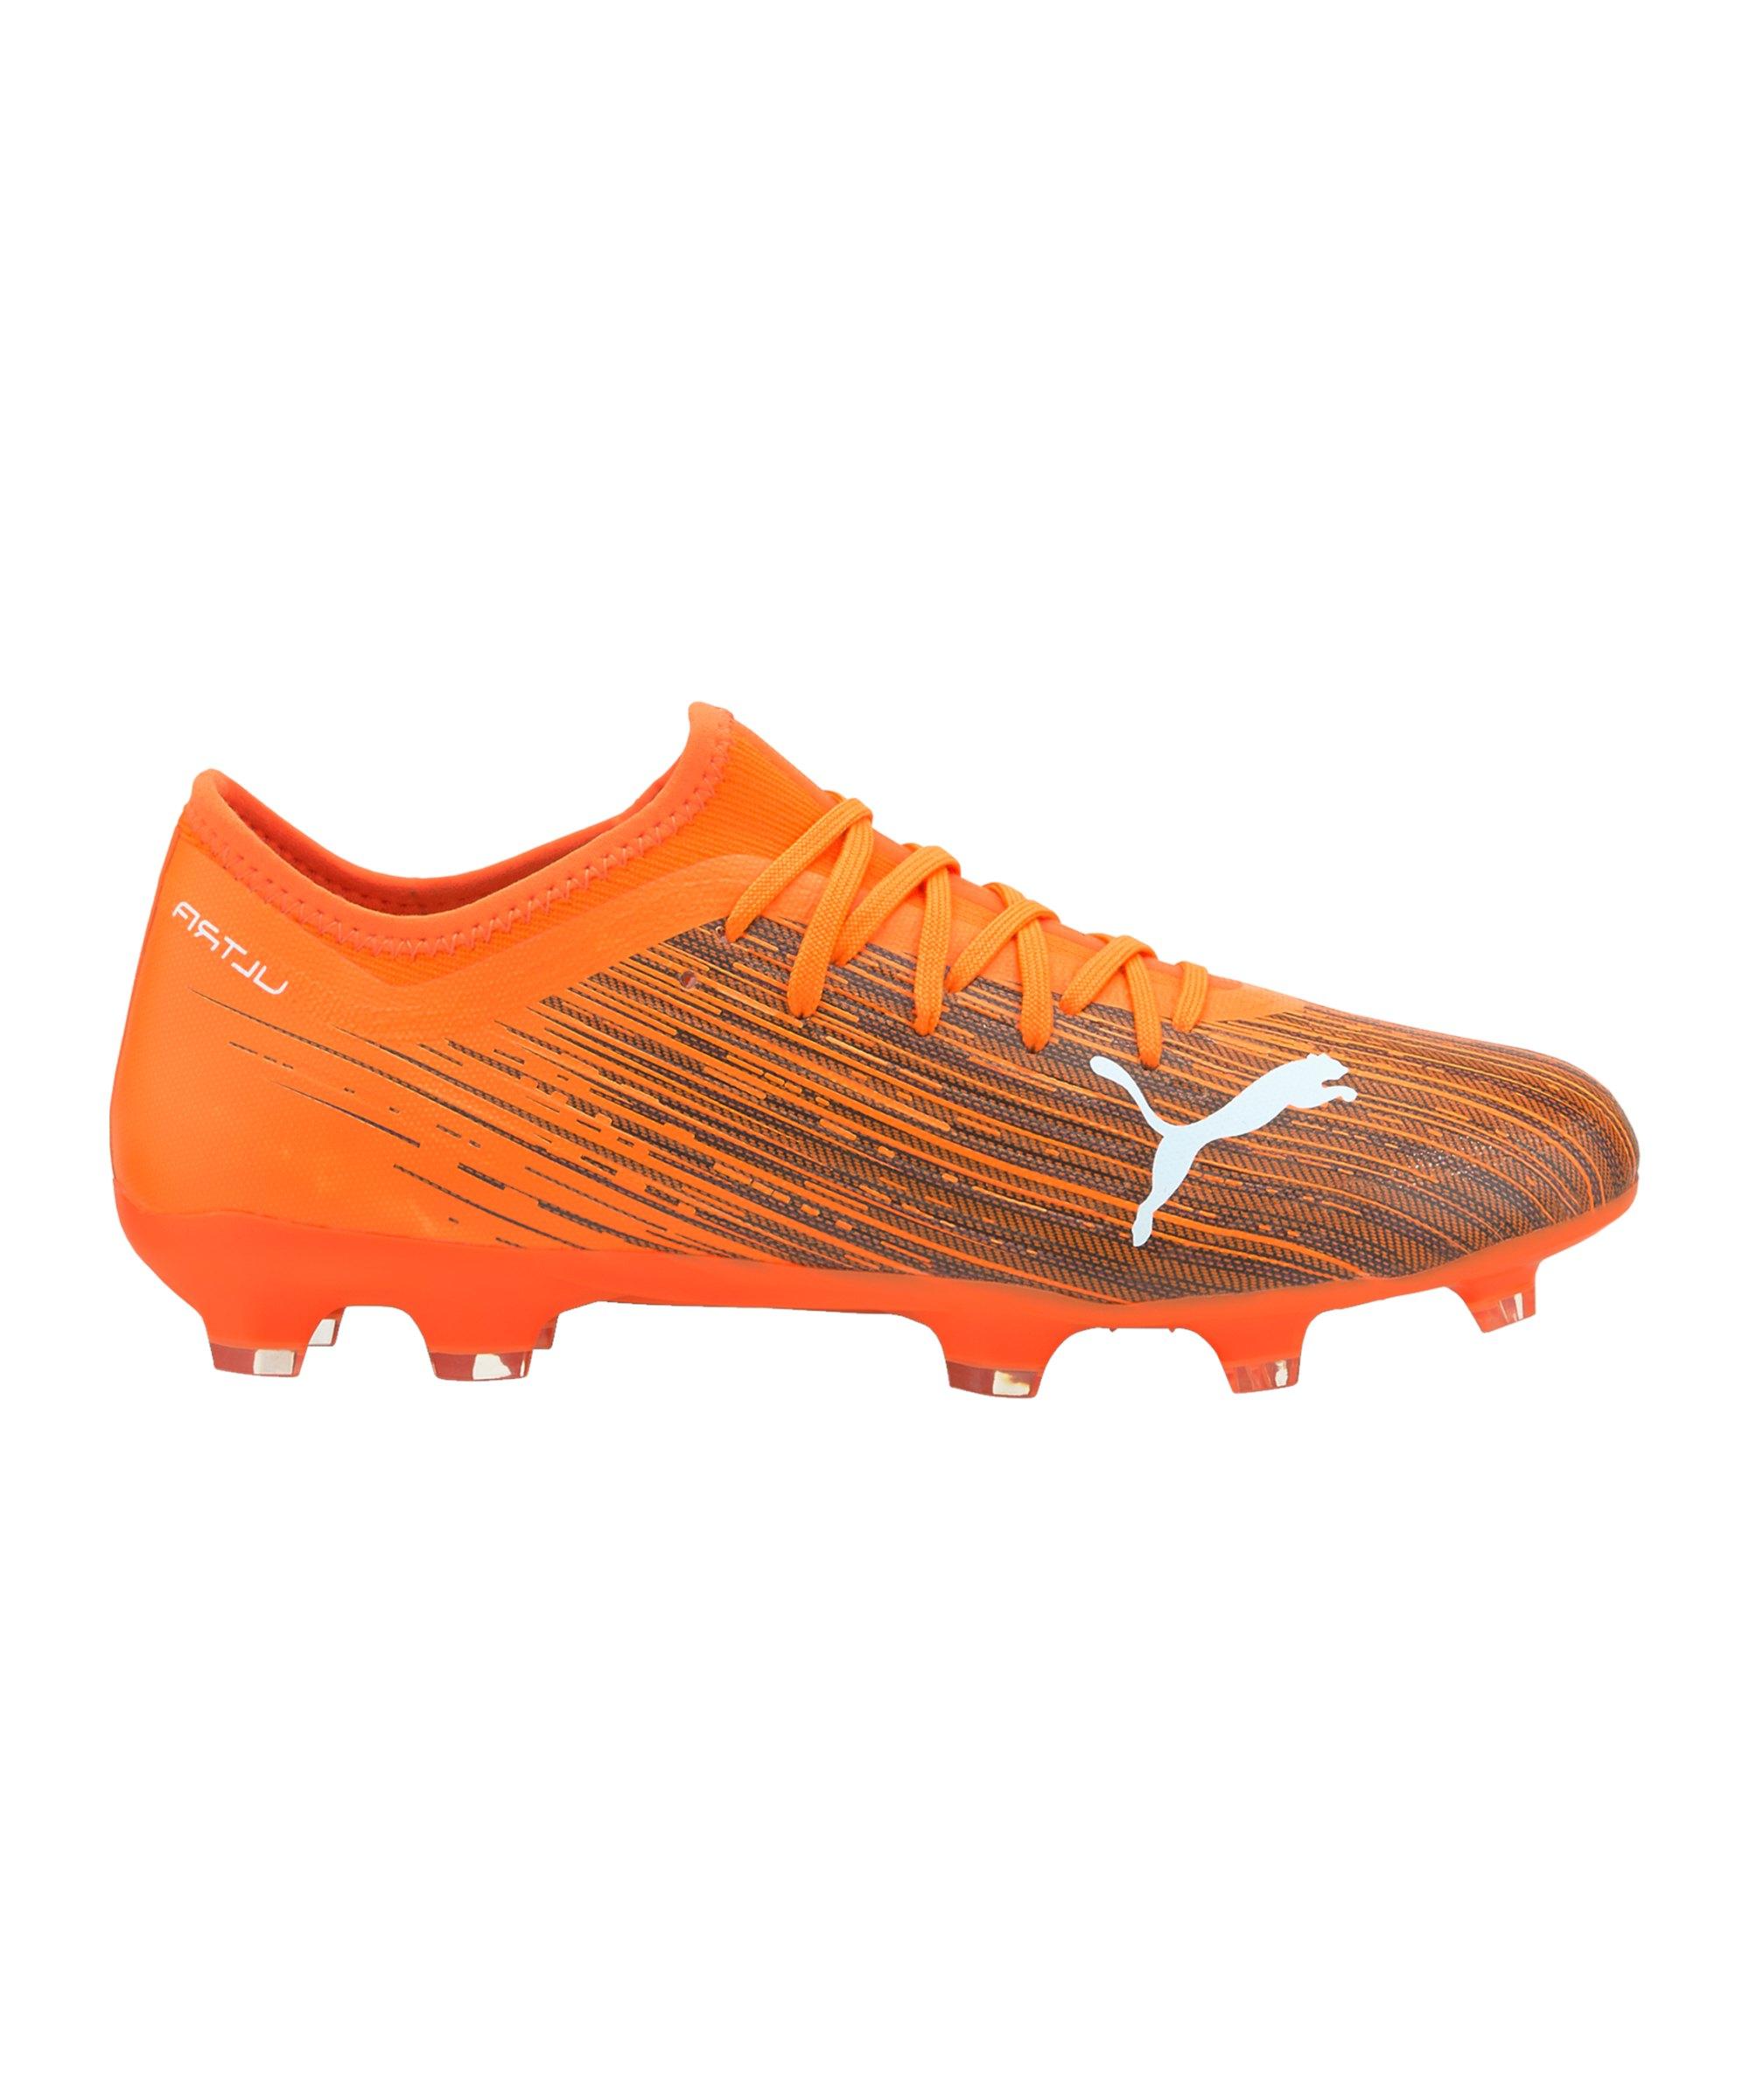 PUMA ULTRA Chasing Adrenaline 3.1 FG/AG Orange F01 - orange